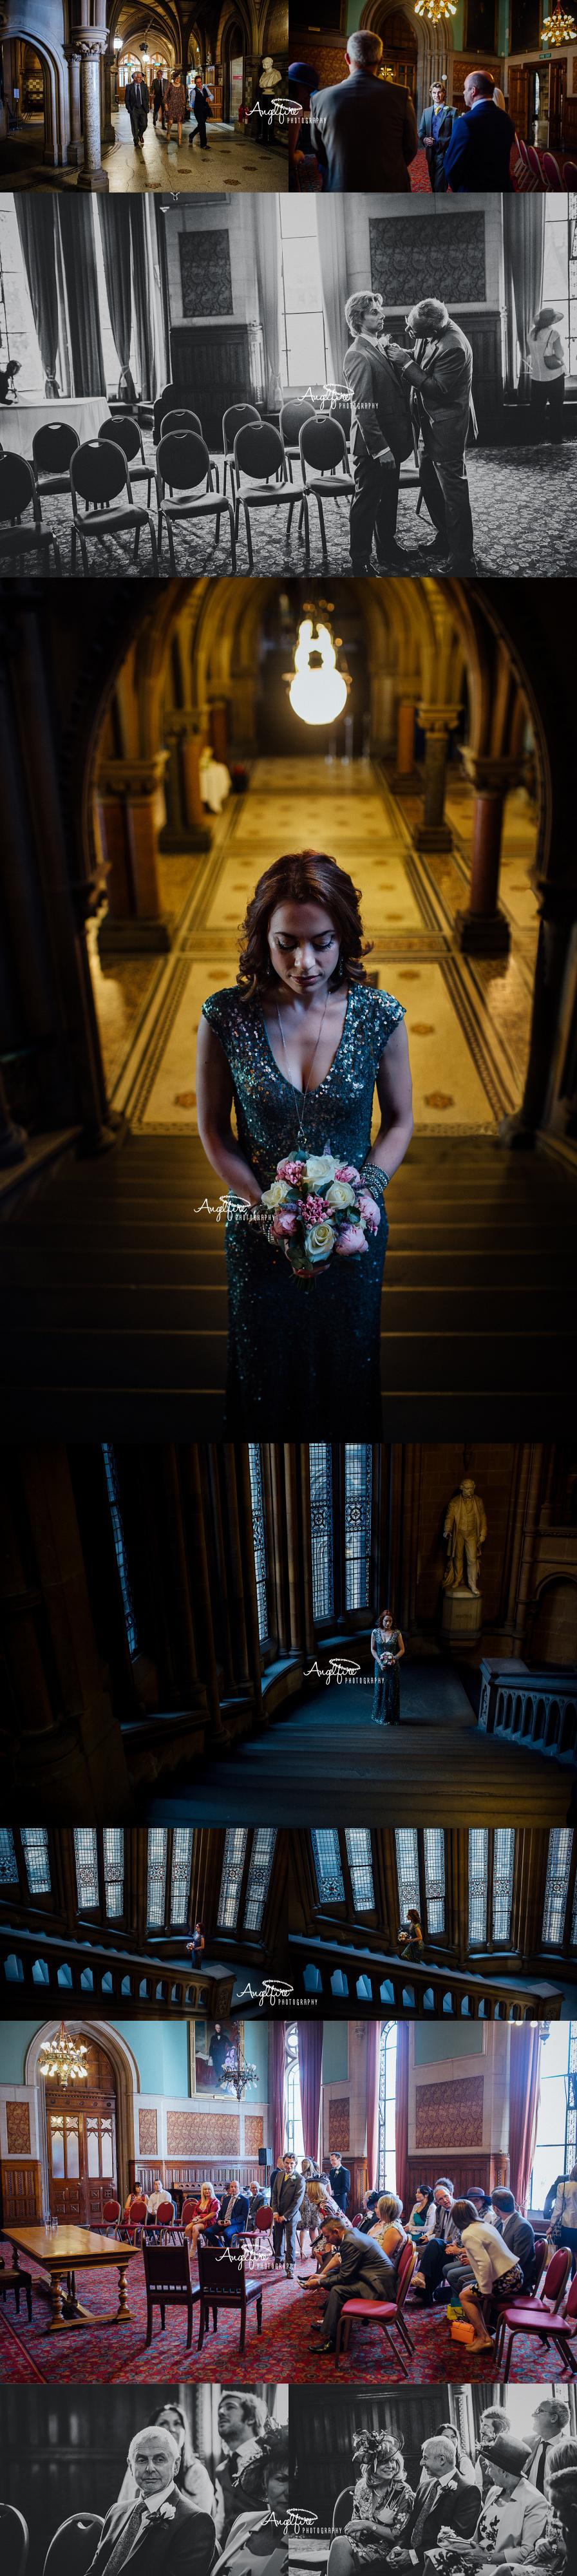 West Midlands Wedding Photographer | Angelfire Photography | www.angelfirephotography.co.uk2